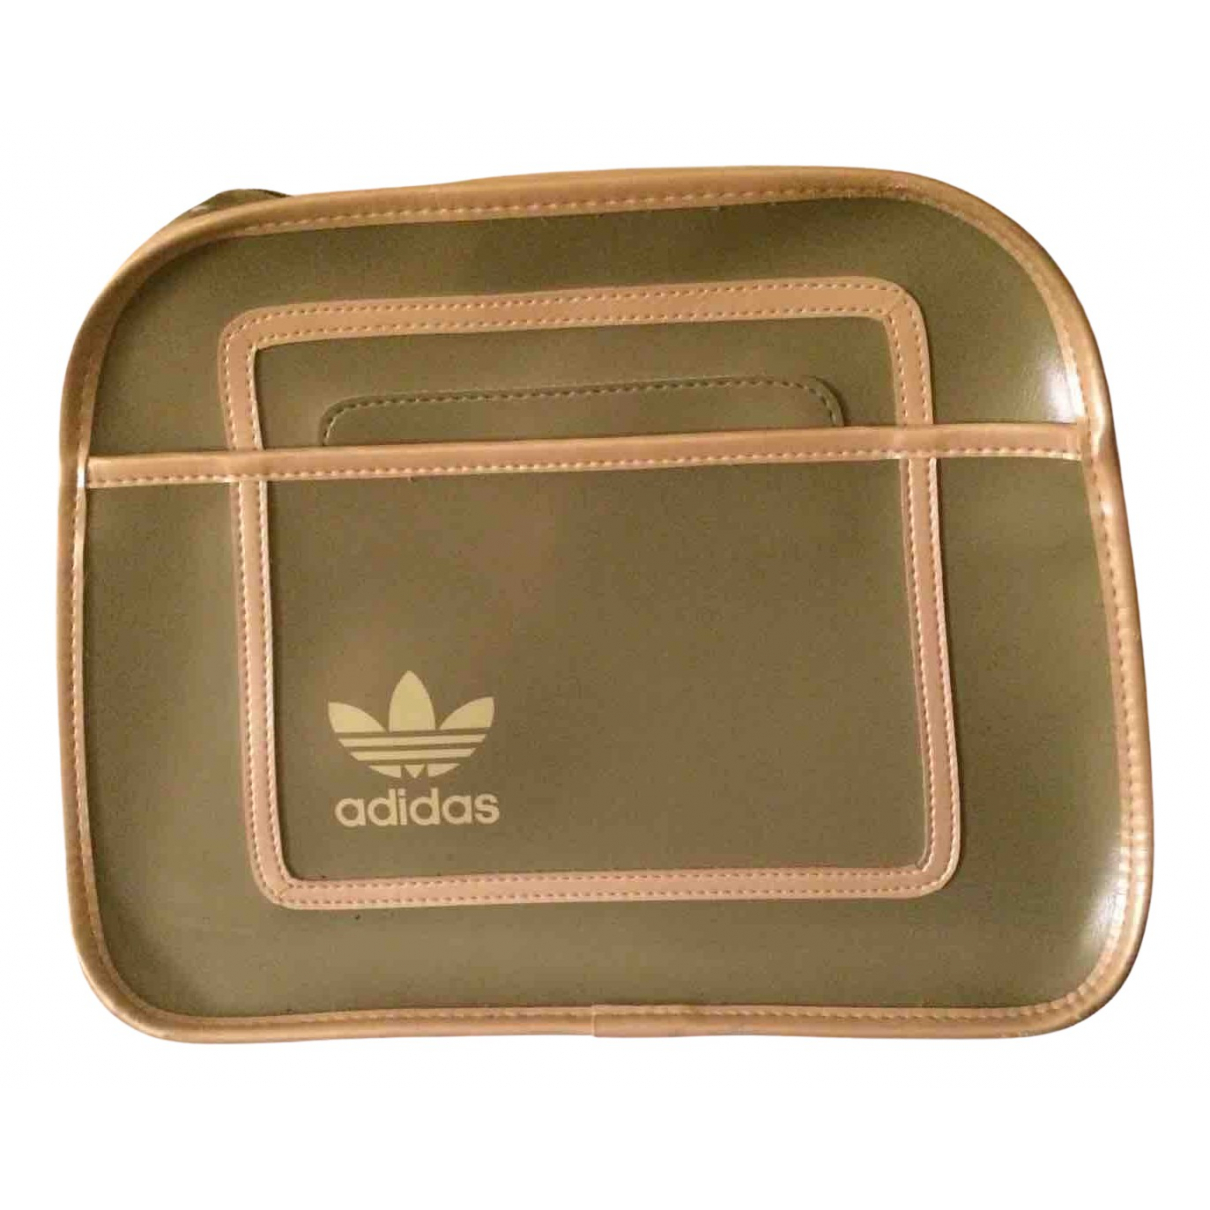 Adidas \N Khaki handbag for Women \N